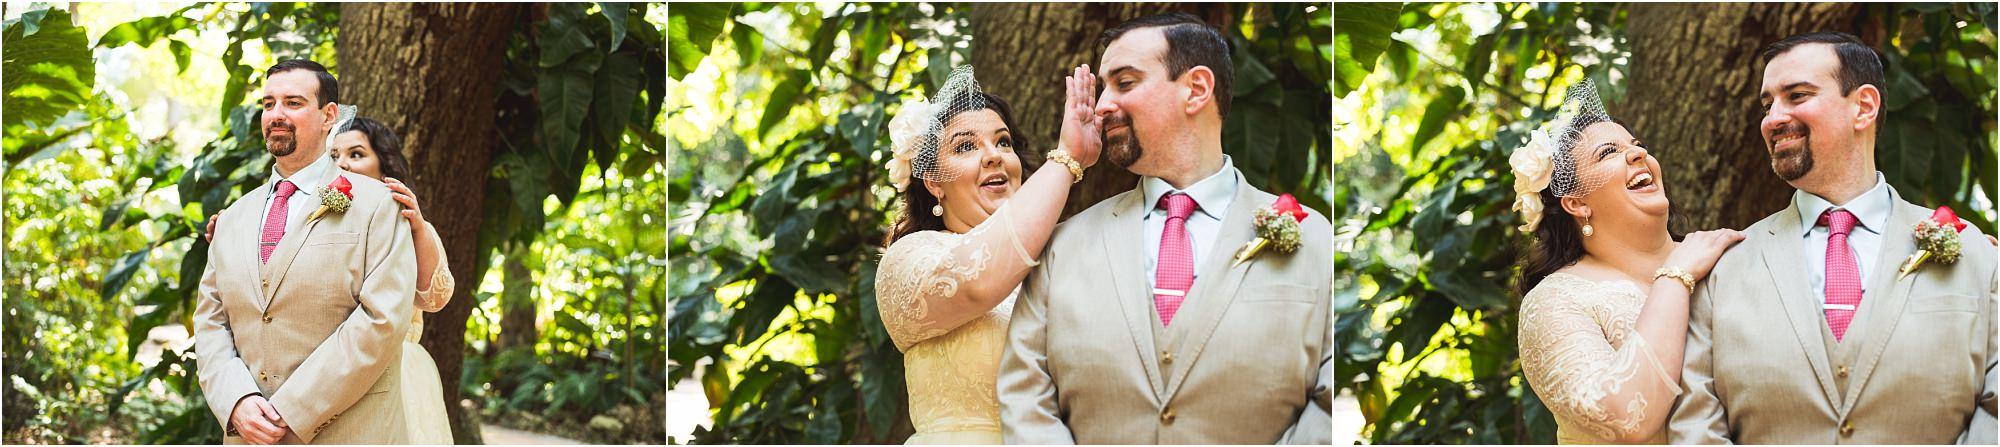 outdoor-rustic-pincrest-gardens-wedding-miami-photographer-jessenia-gonzalez_1010.jpg